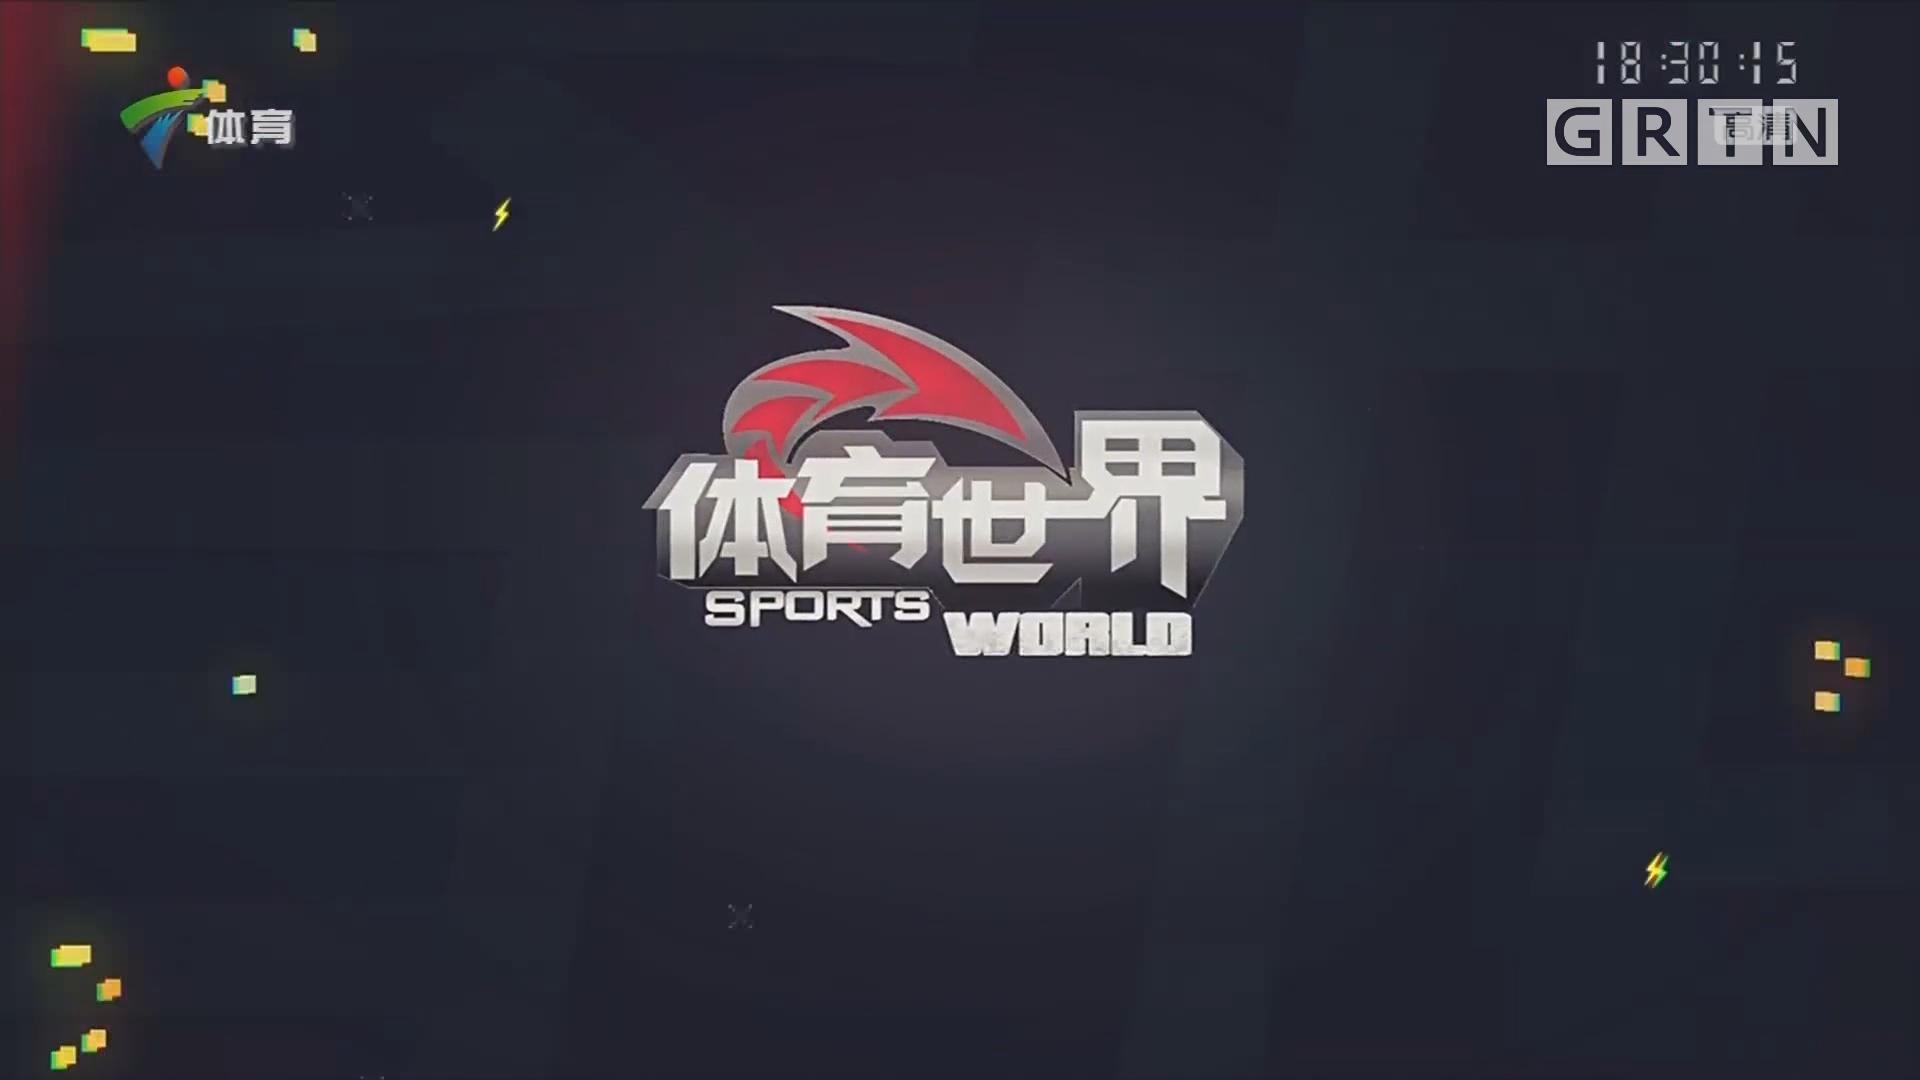 [HD][2019-03-13]体育世界:第29届大冬会闭幕 中国代表团位列金牌榜第14名